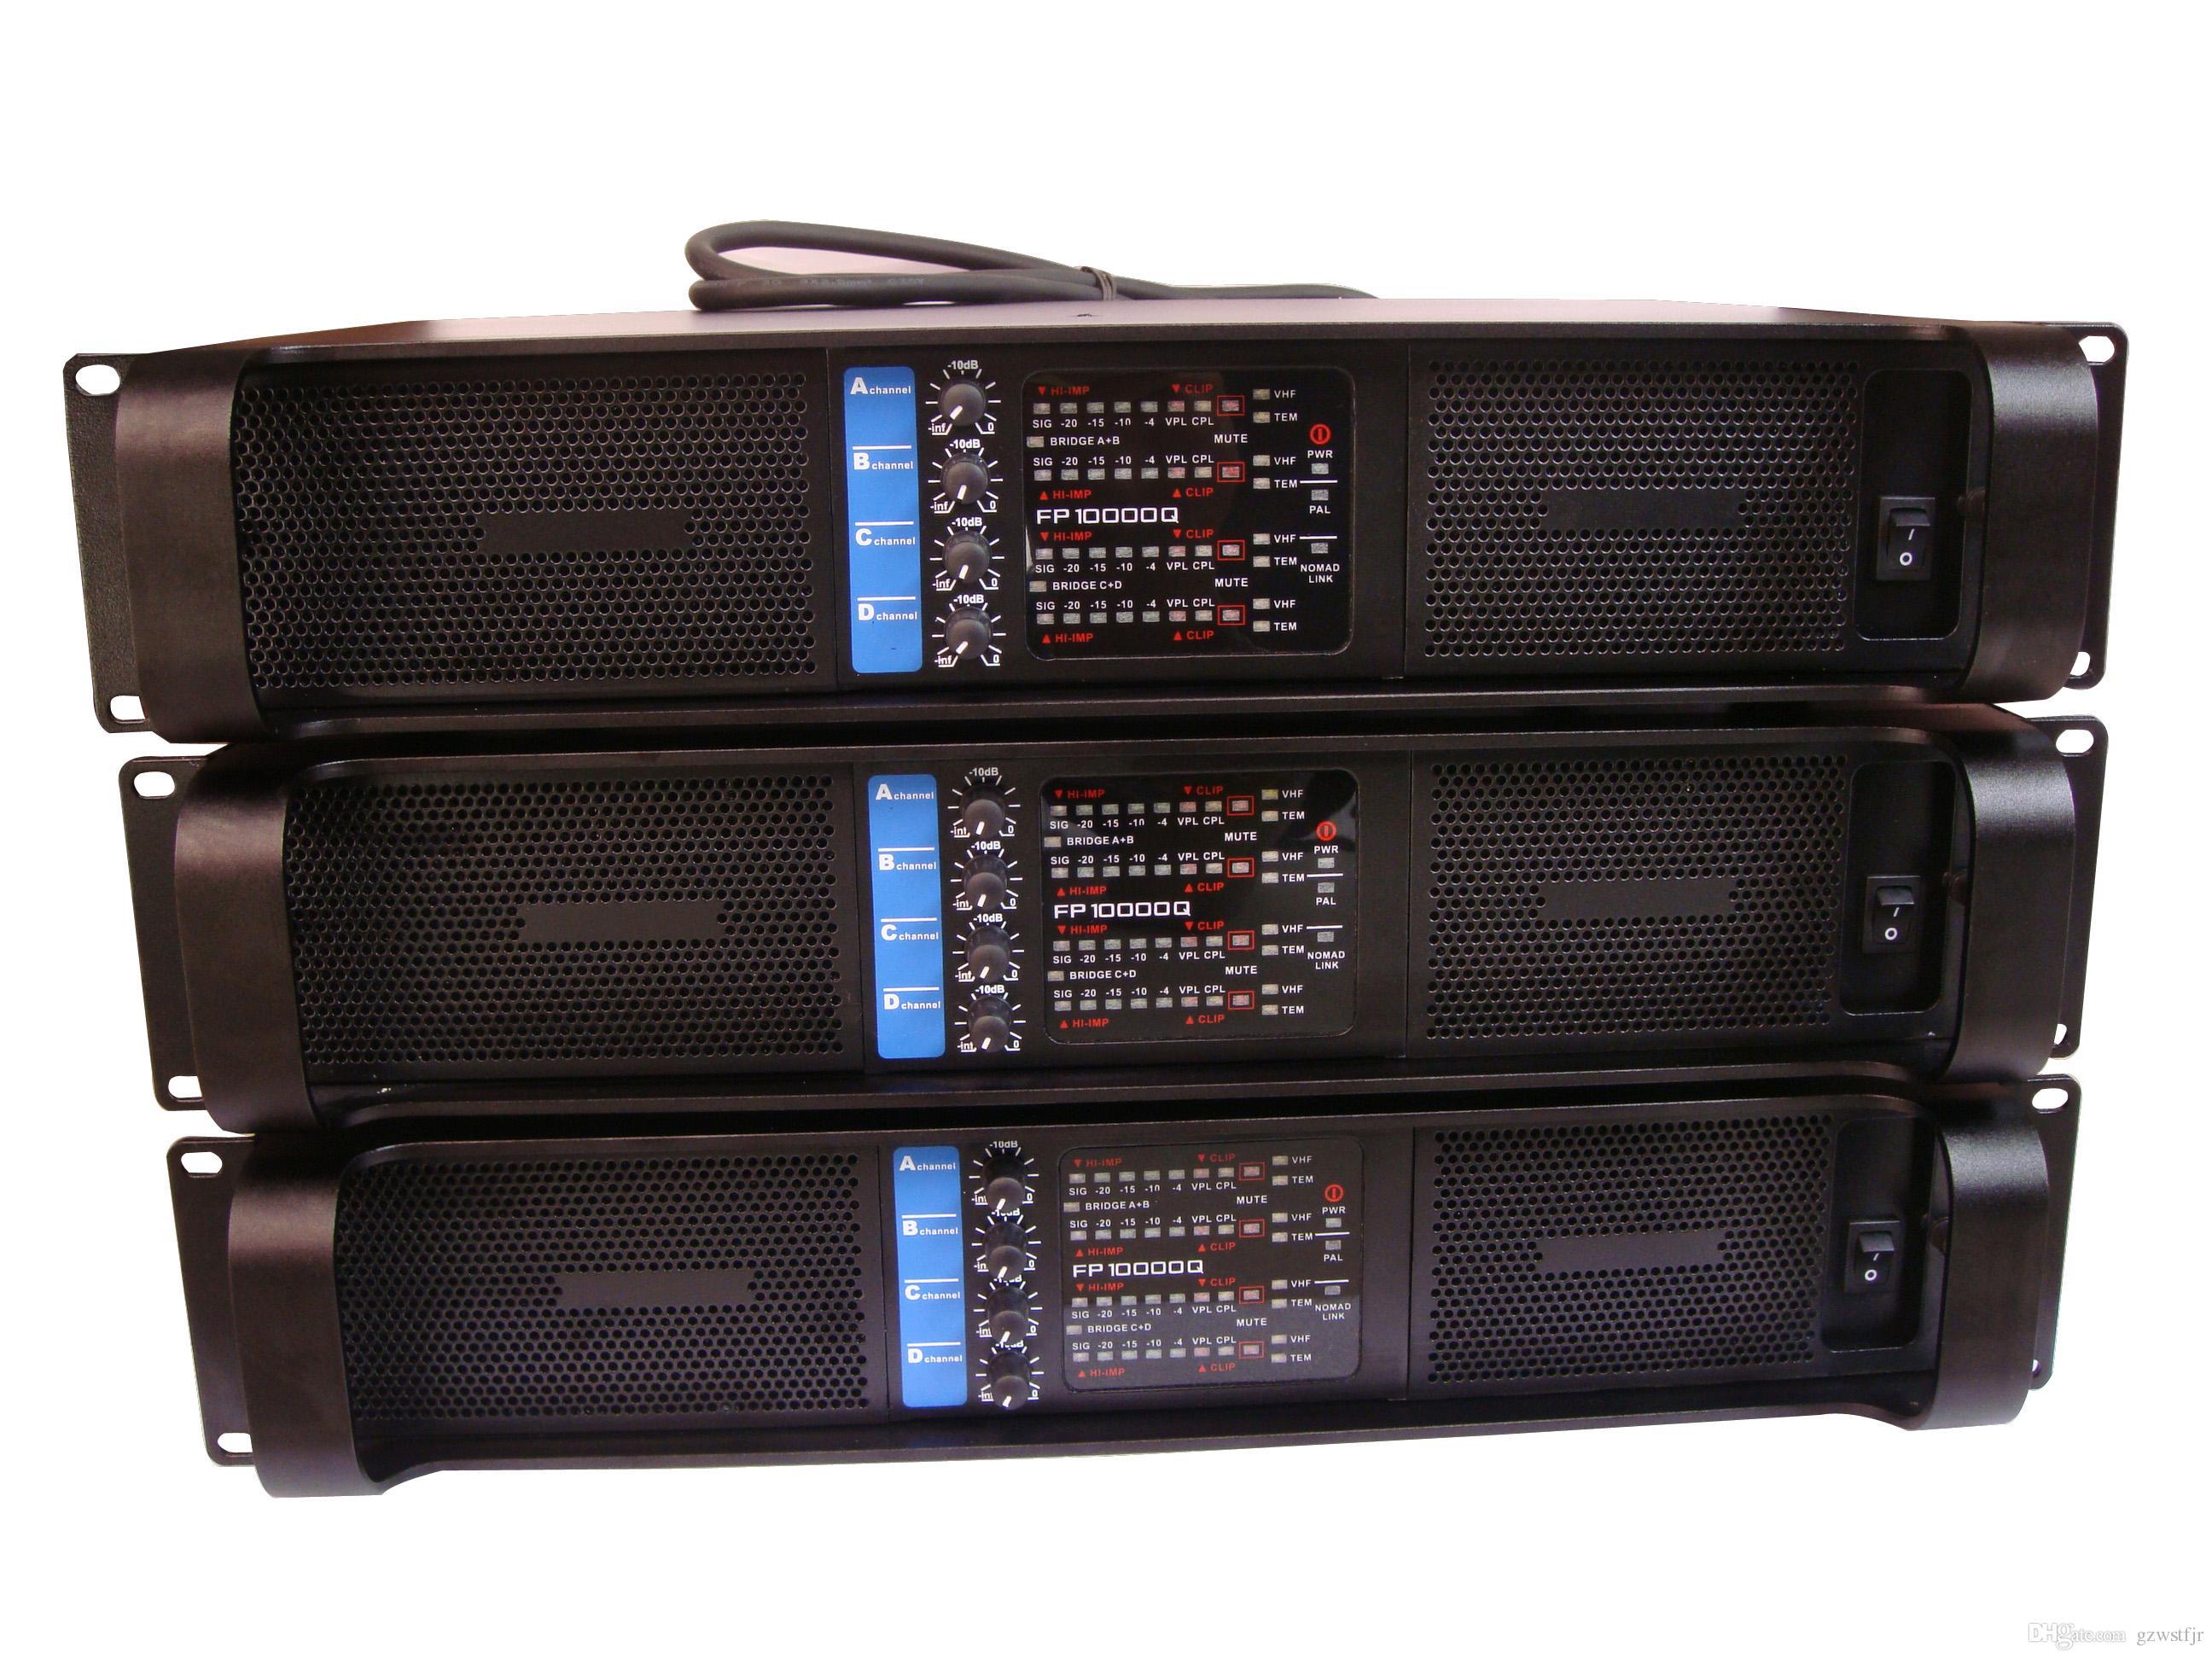 fp10000q 4 channel amplifier fp10000q gruppen line array amplifier professional 4 2500w lab. Black Bedroom Furniture Sets. Home Design Ideas